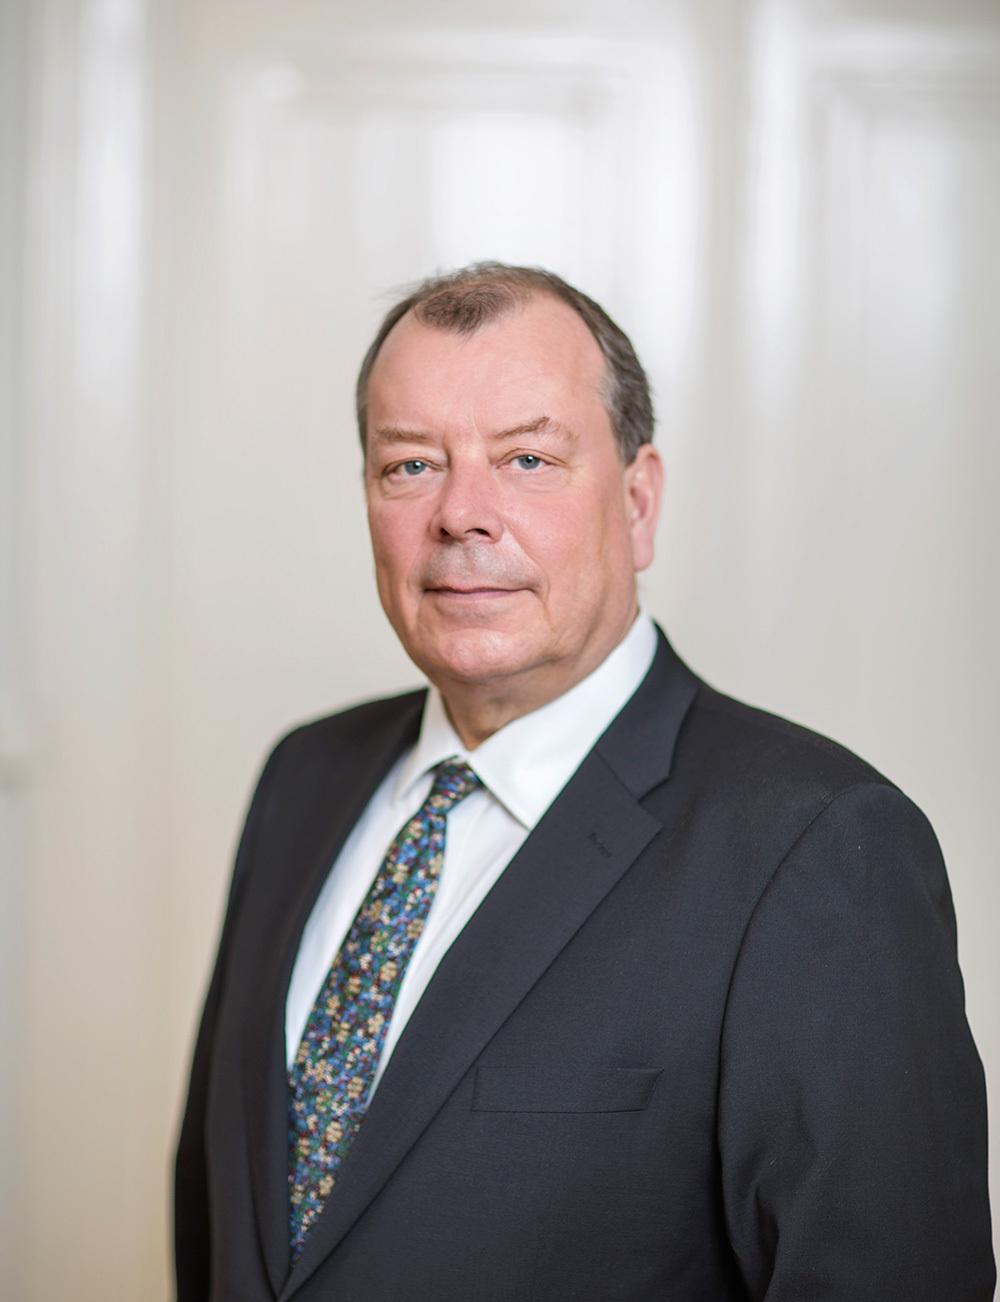 Juha Sarasto